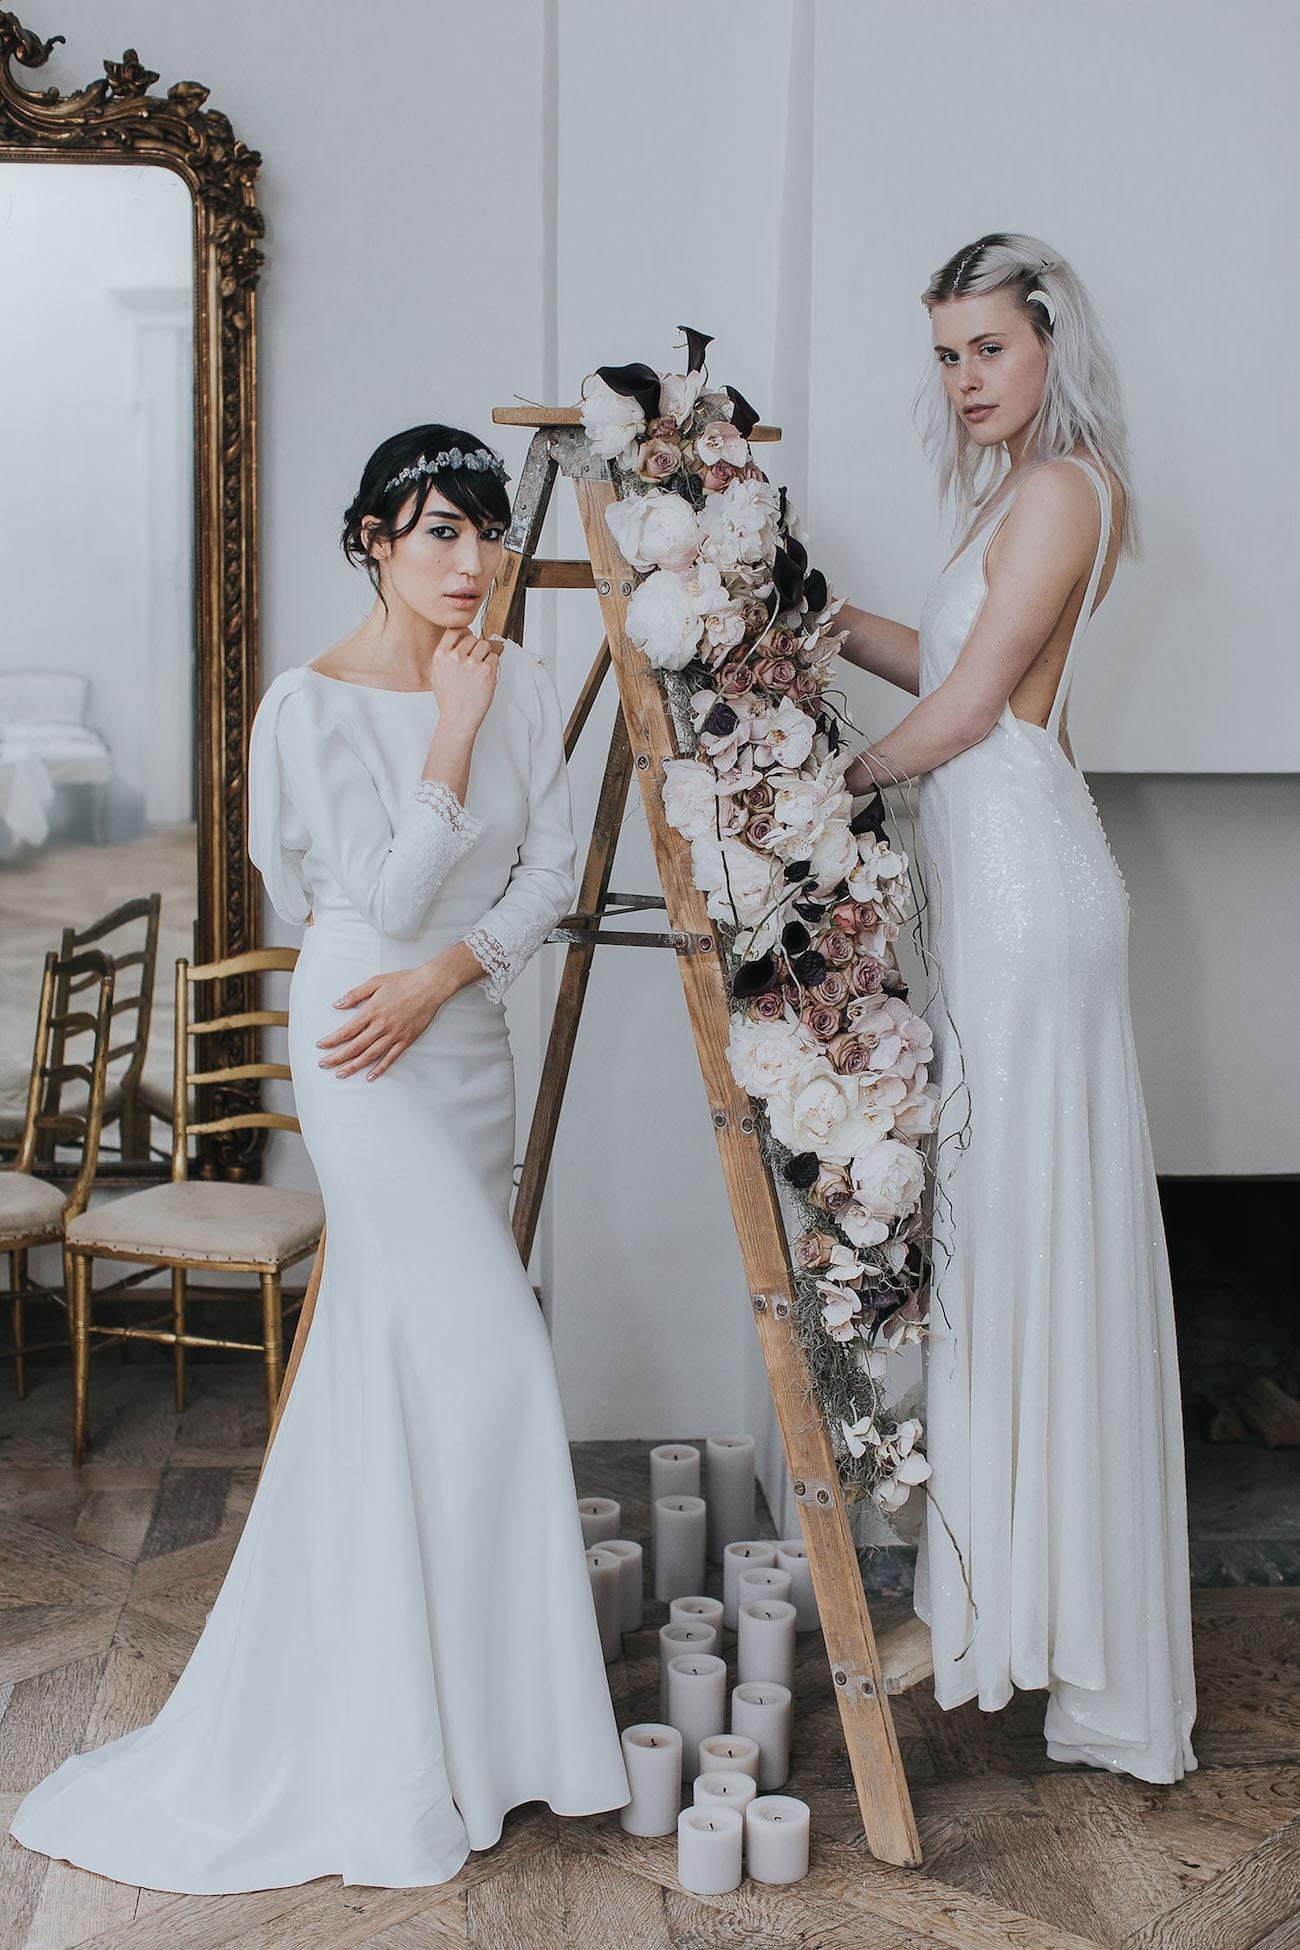 Celestial Wedding Dresses | Credit: Cornelia Lietz